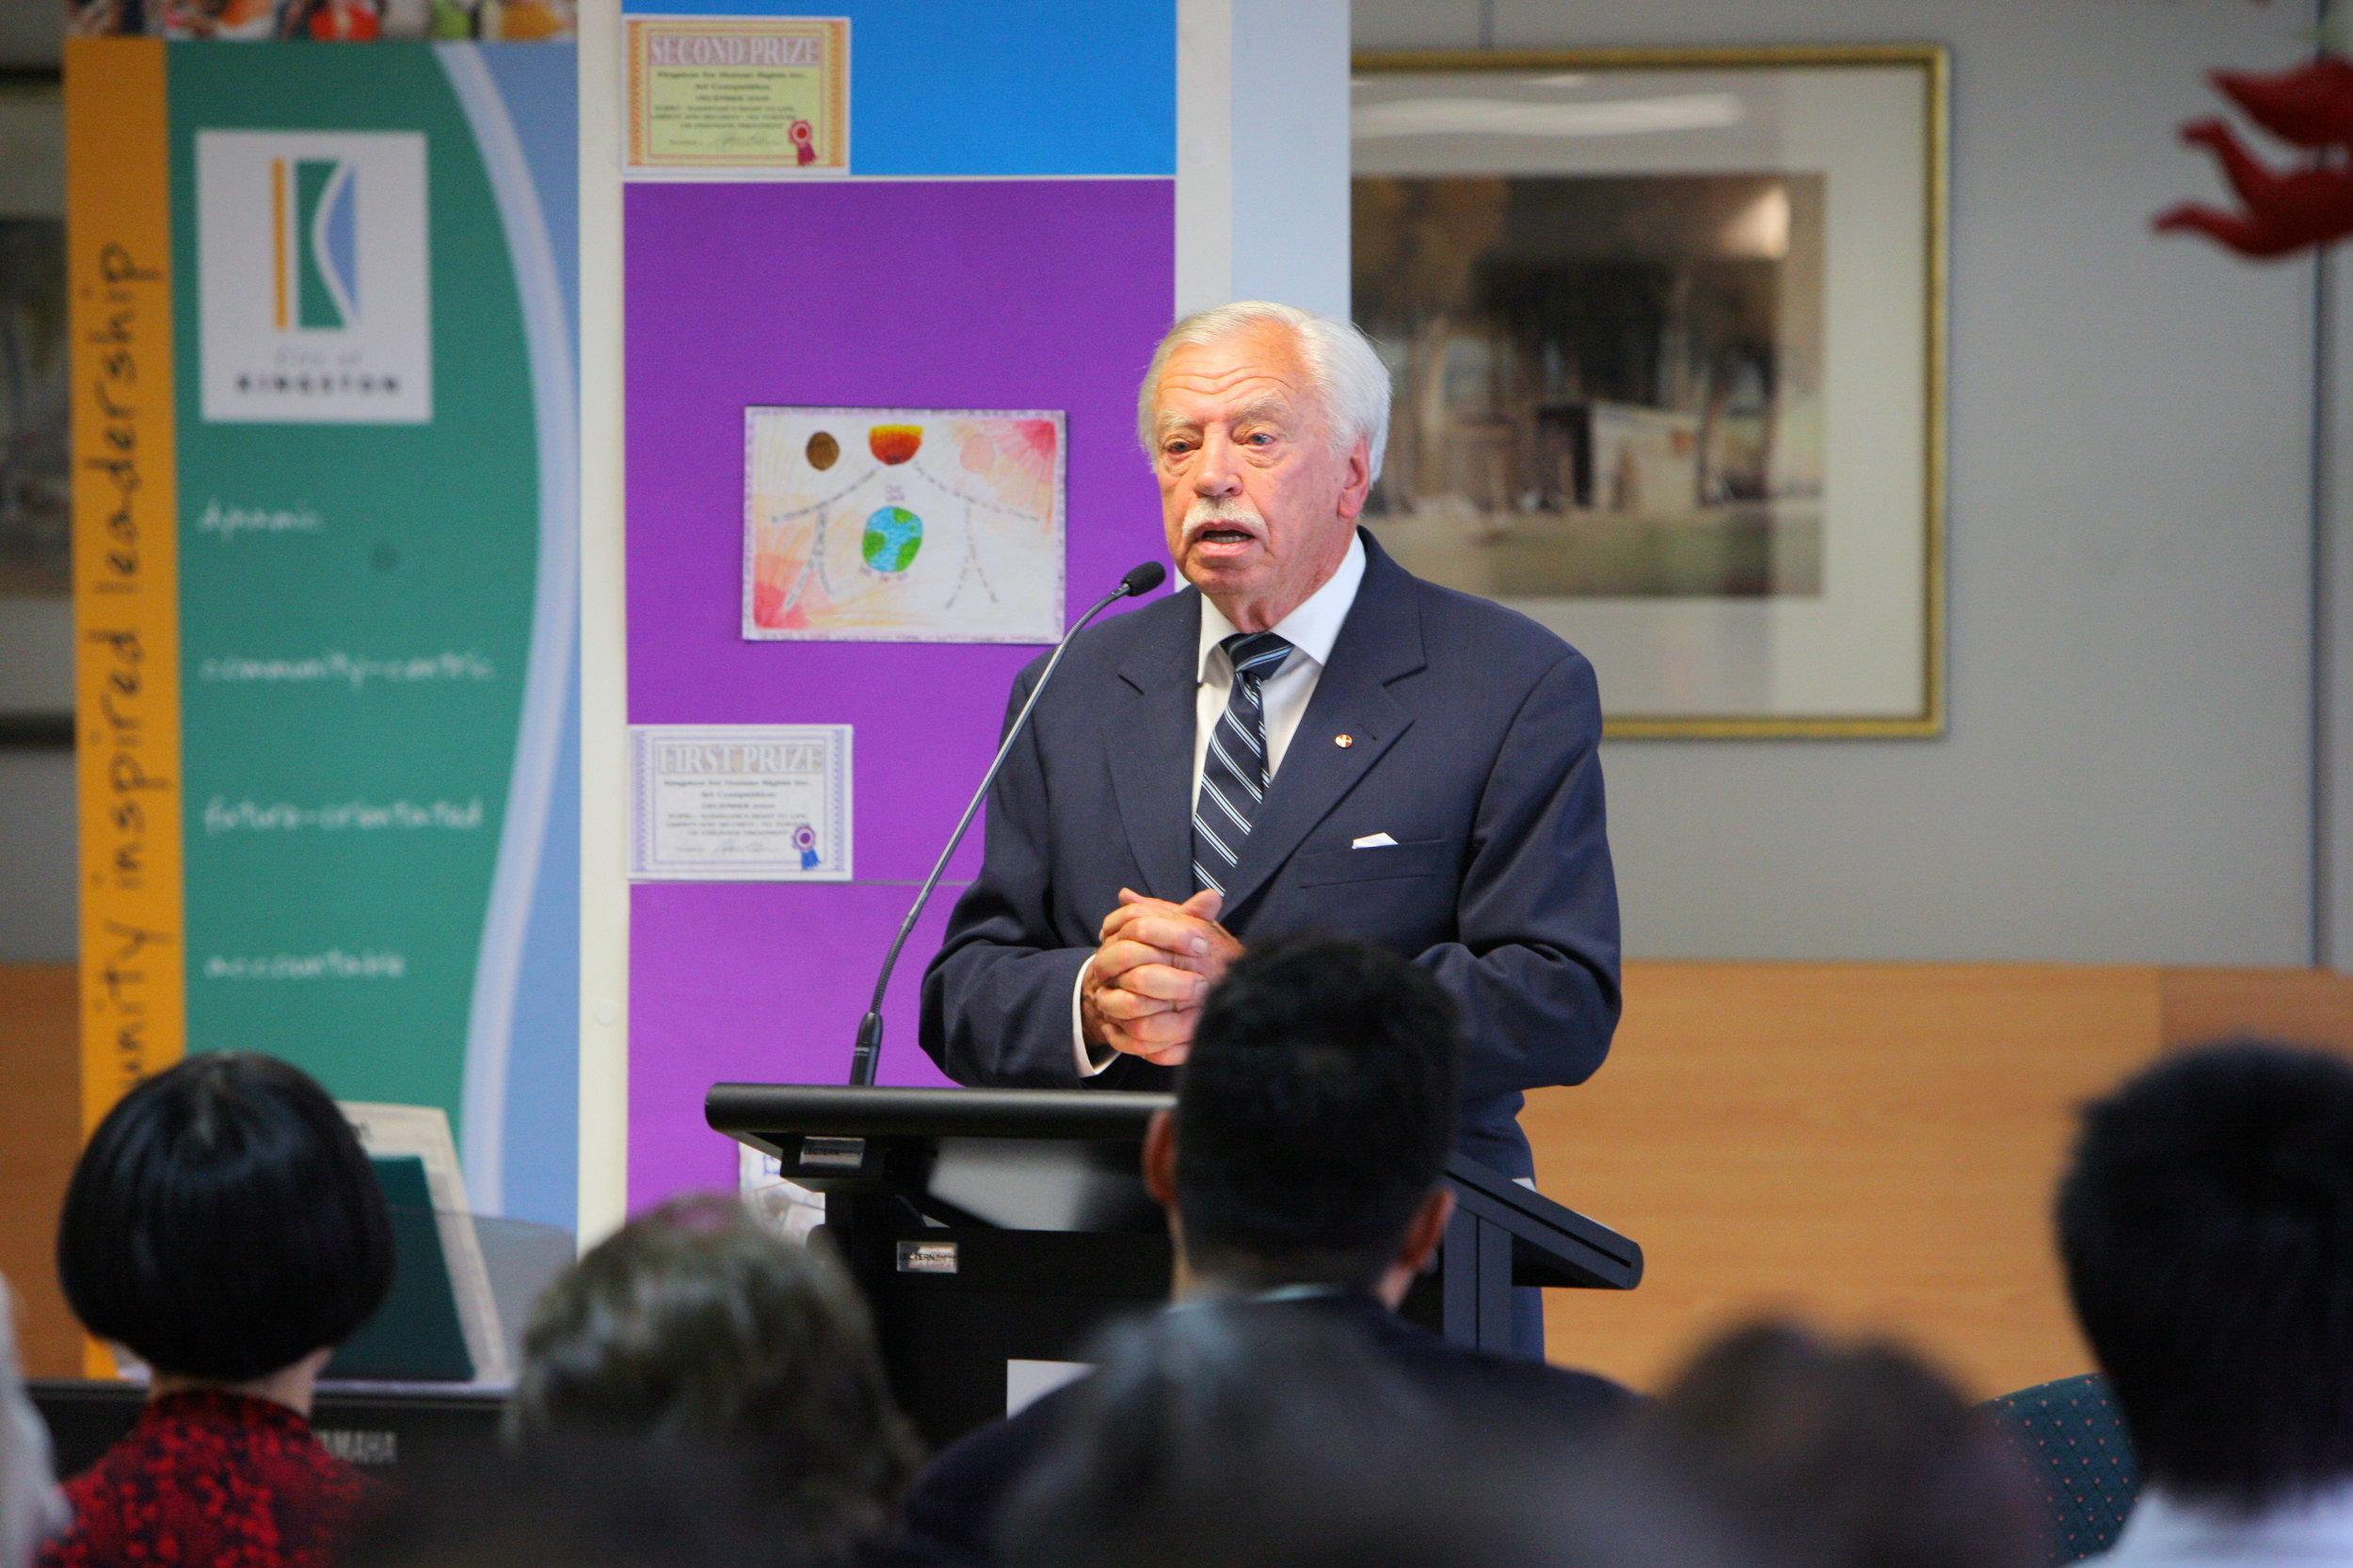 Kingston人權協會主席克頓先生(Denis Cowden)。(攝影:陳明/大紀元)